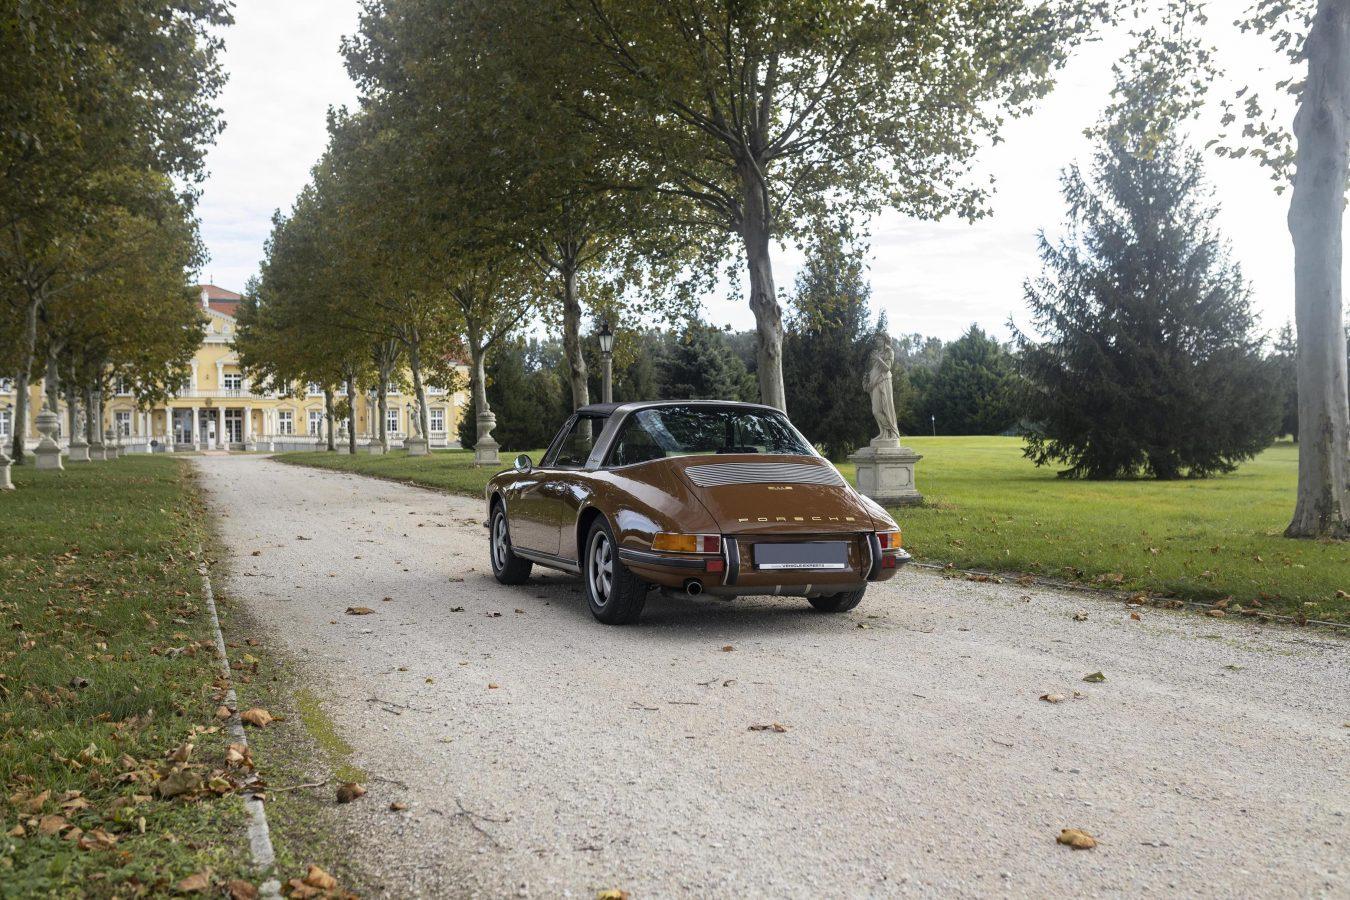 Sepiabraun 911E Targa aus dem Jahr 1969 6